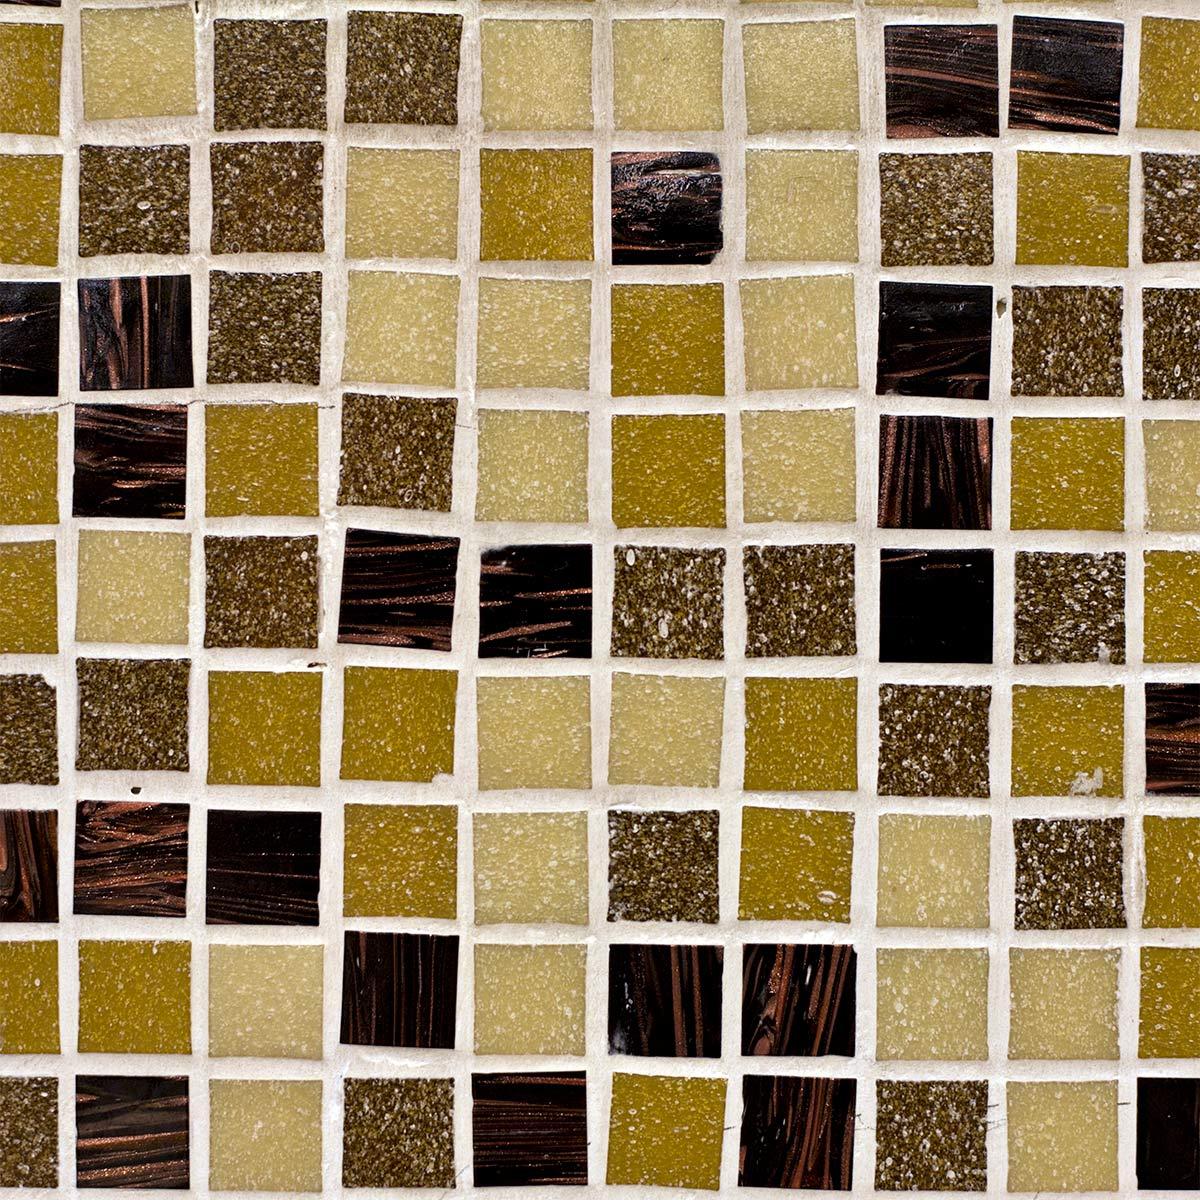 Papel de Parede Pastilha Rústica Tons Diversos Adesivo P185